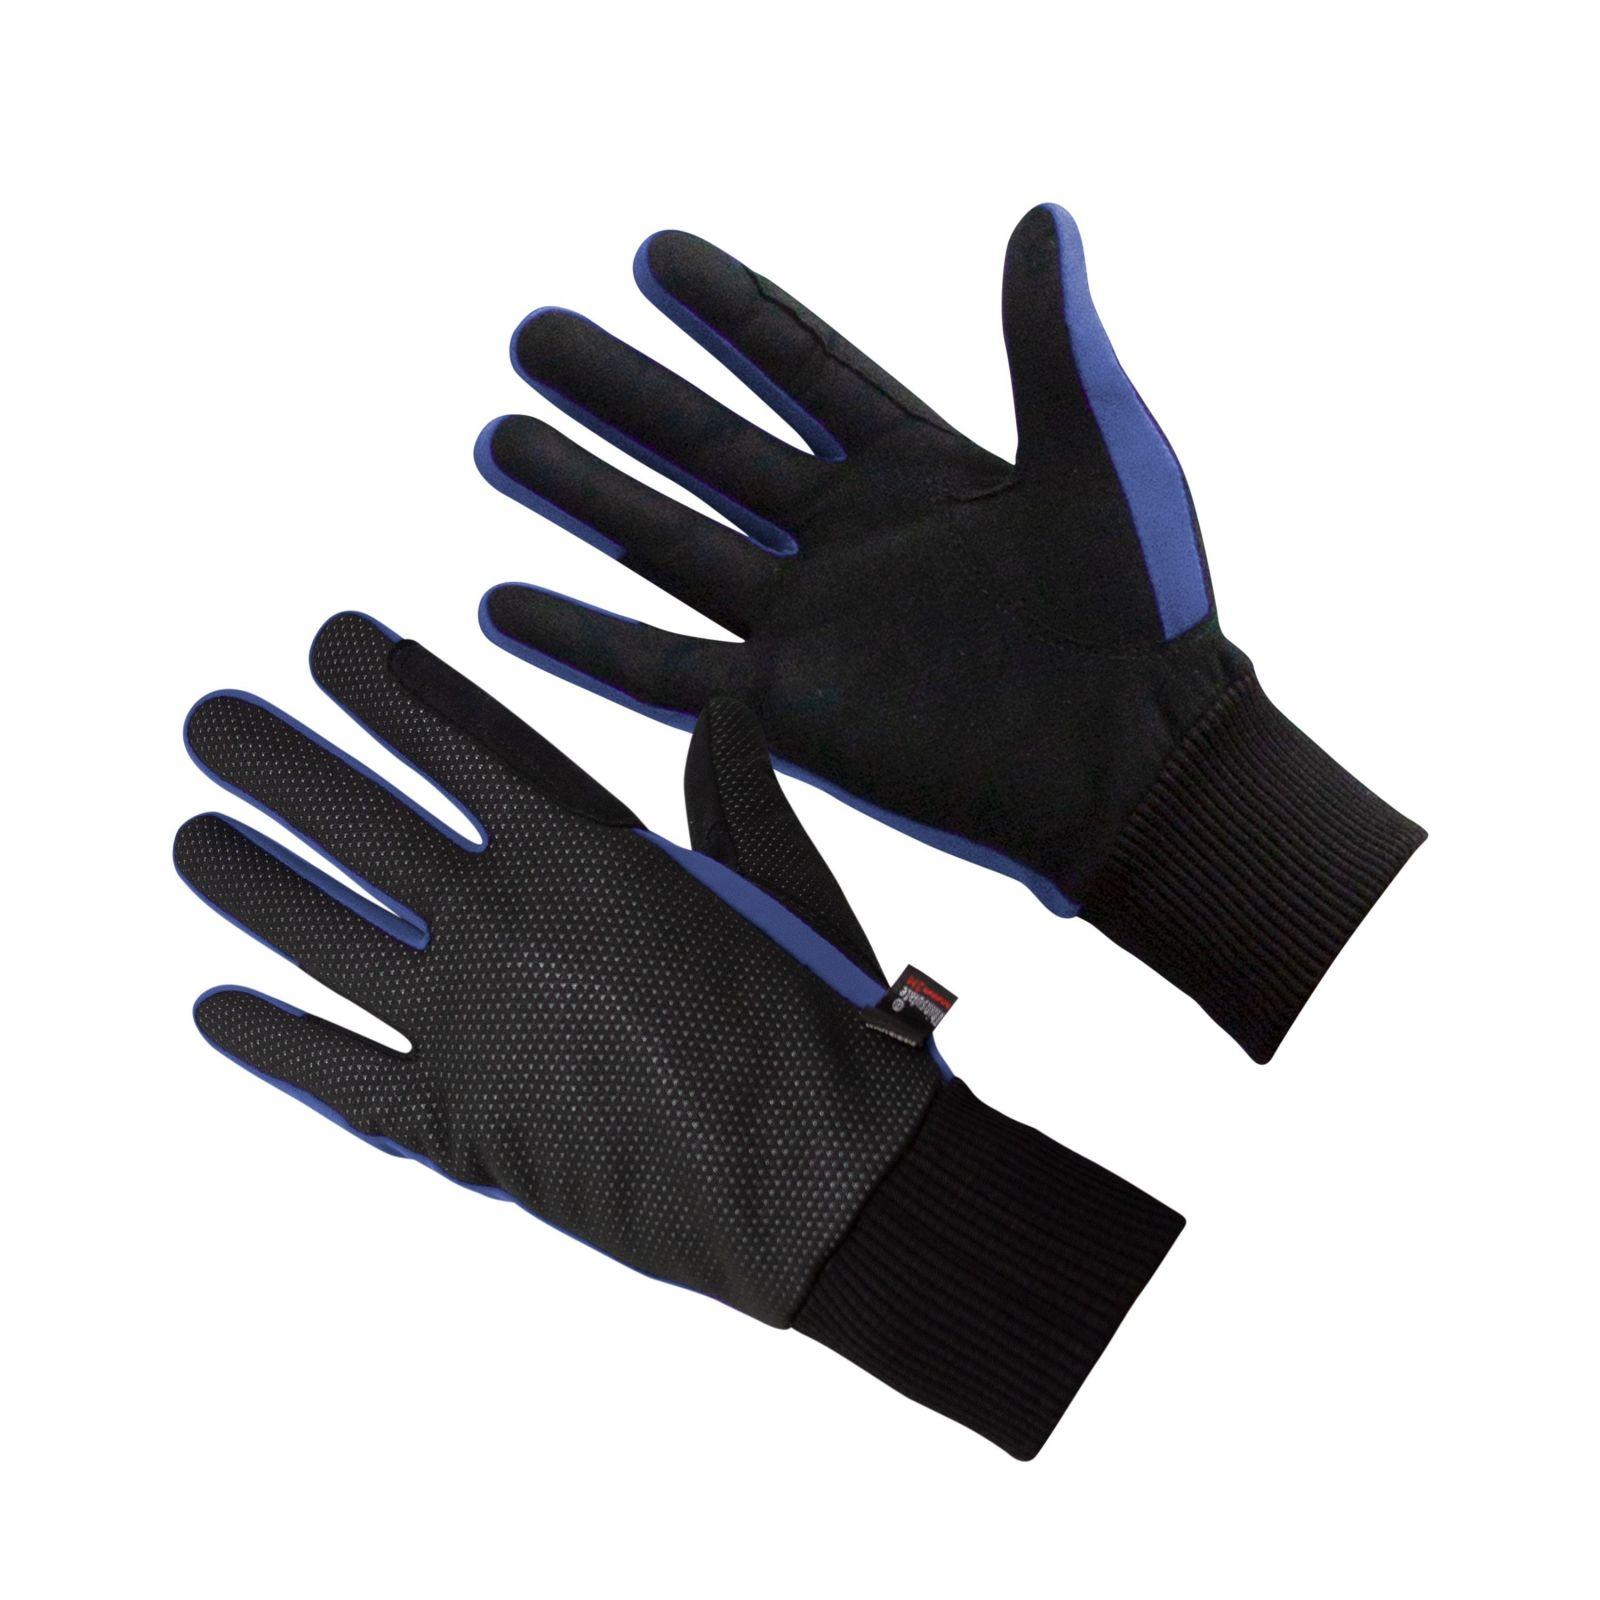 KM Thermal Winter Gloves Navy Blue